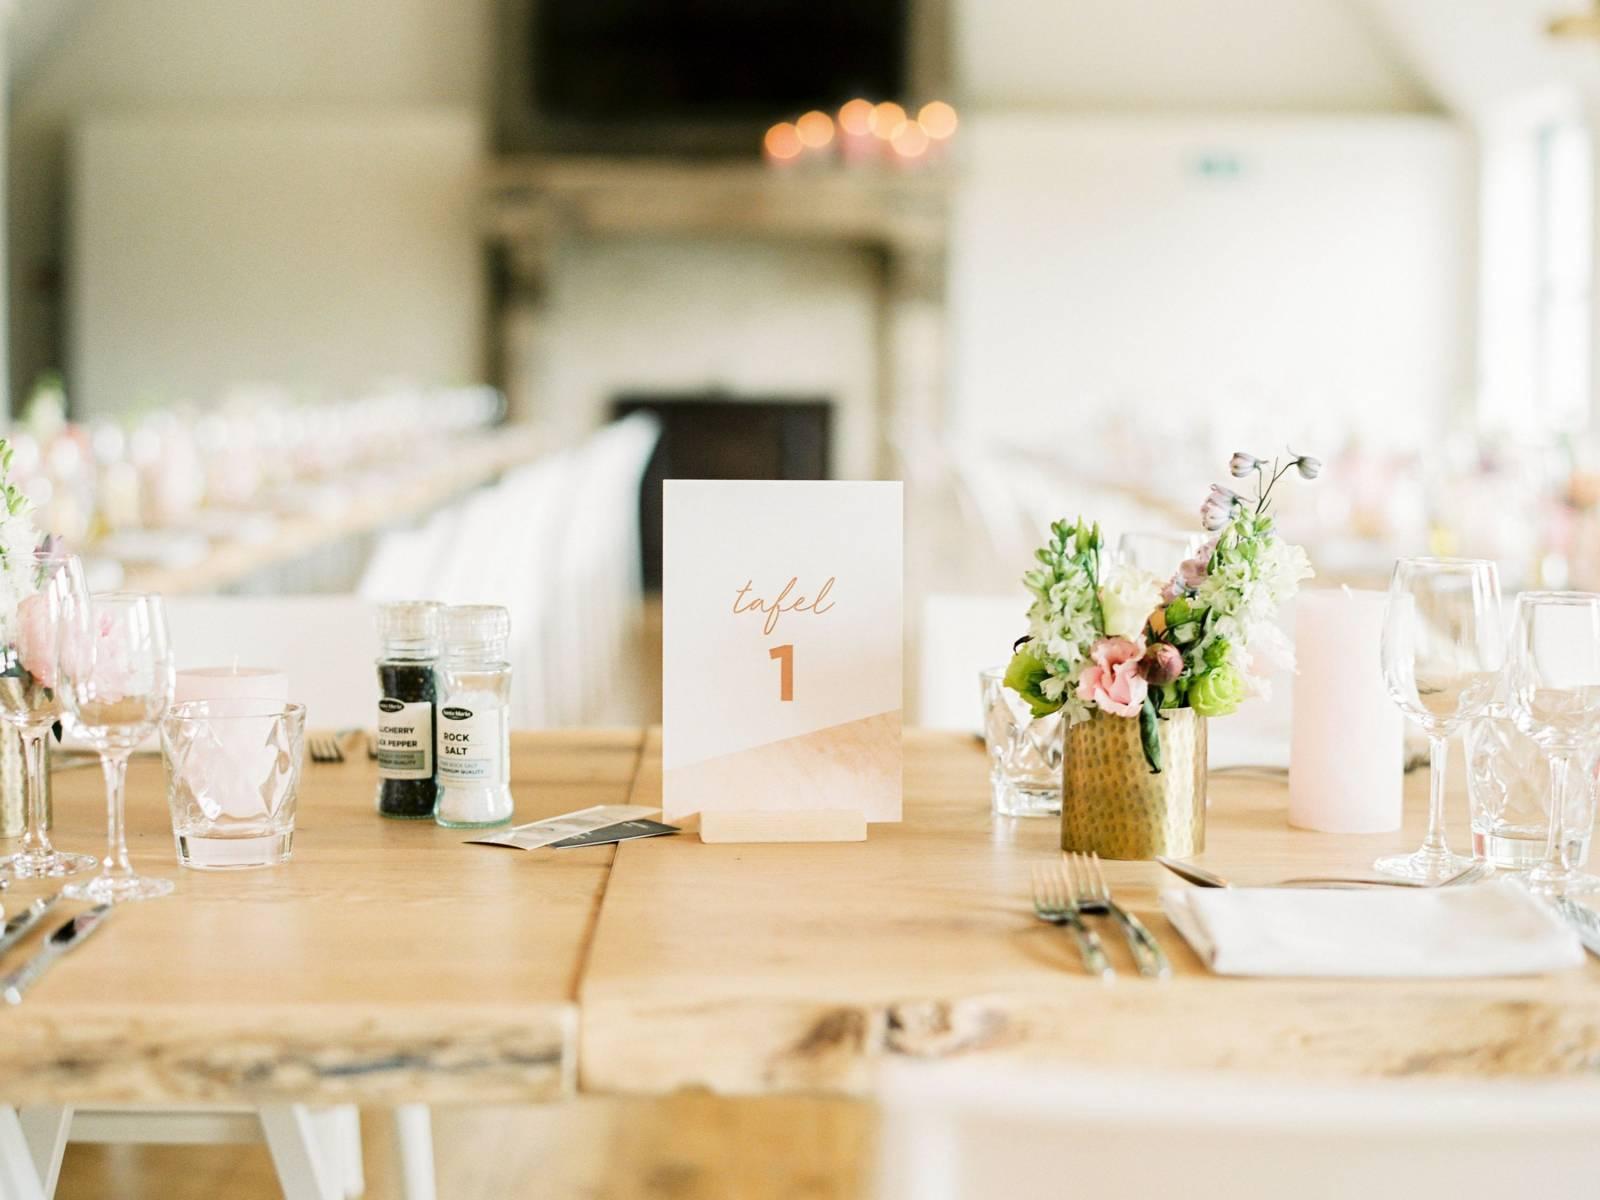 Maison Julie - Bruidsboeket - Bloemen huwelijk trouw bruiloft - Kelly & Jonas - Long Story Short - House of Weddings - 17